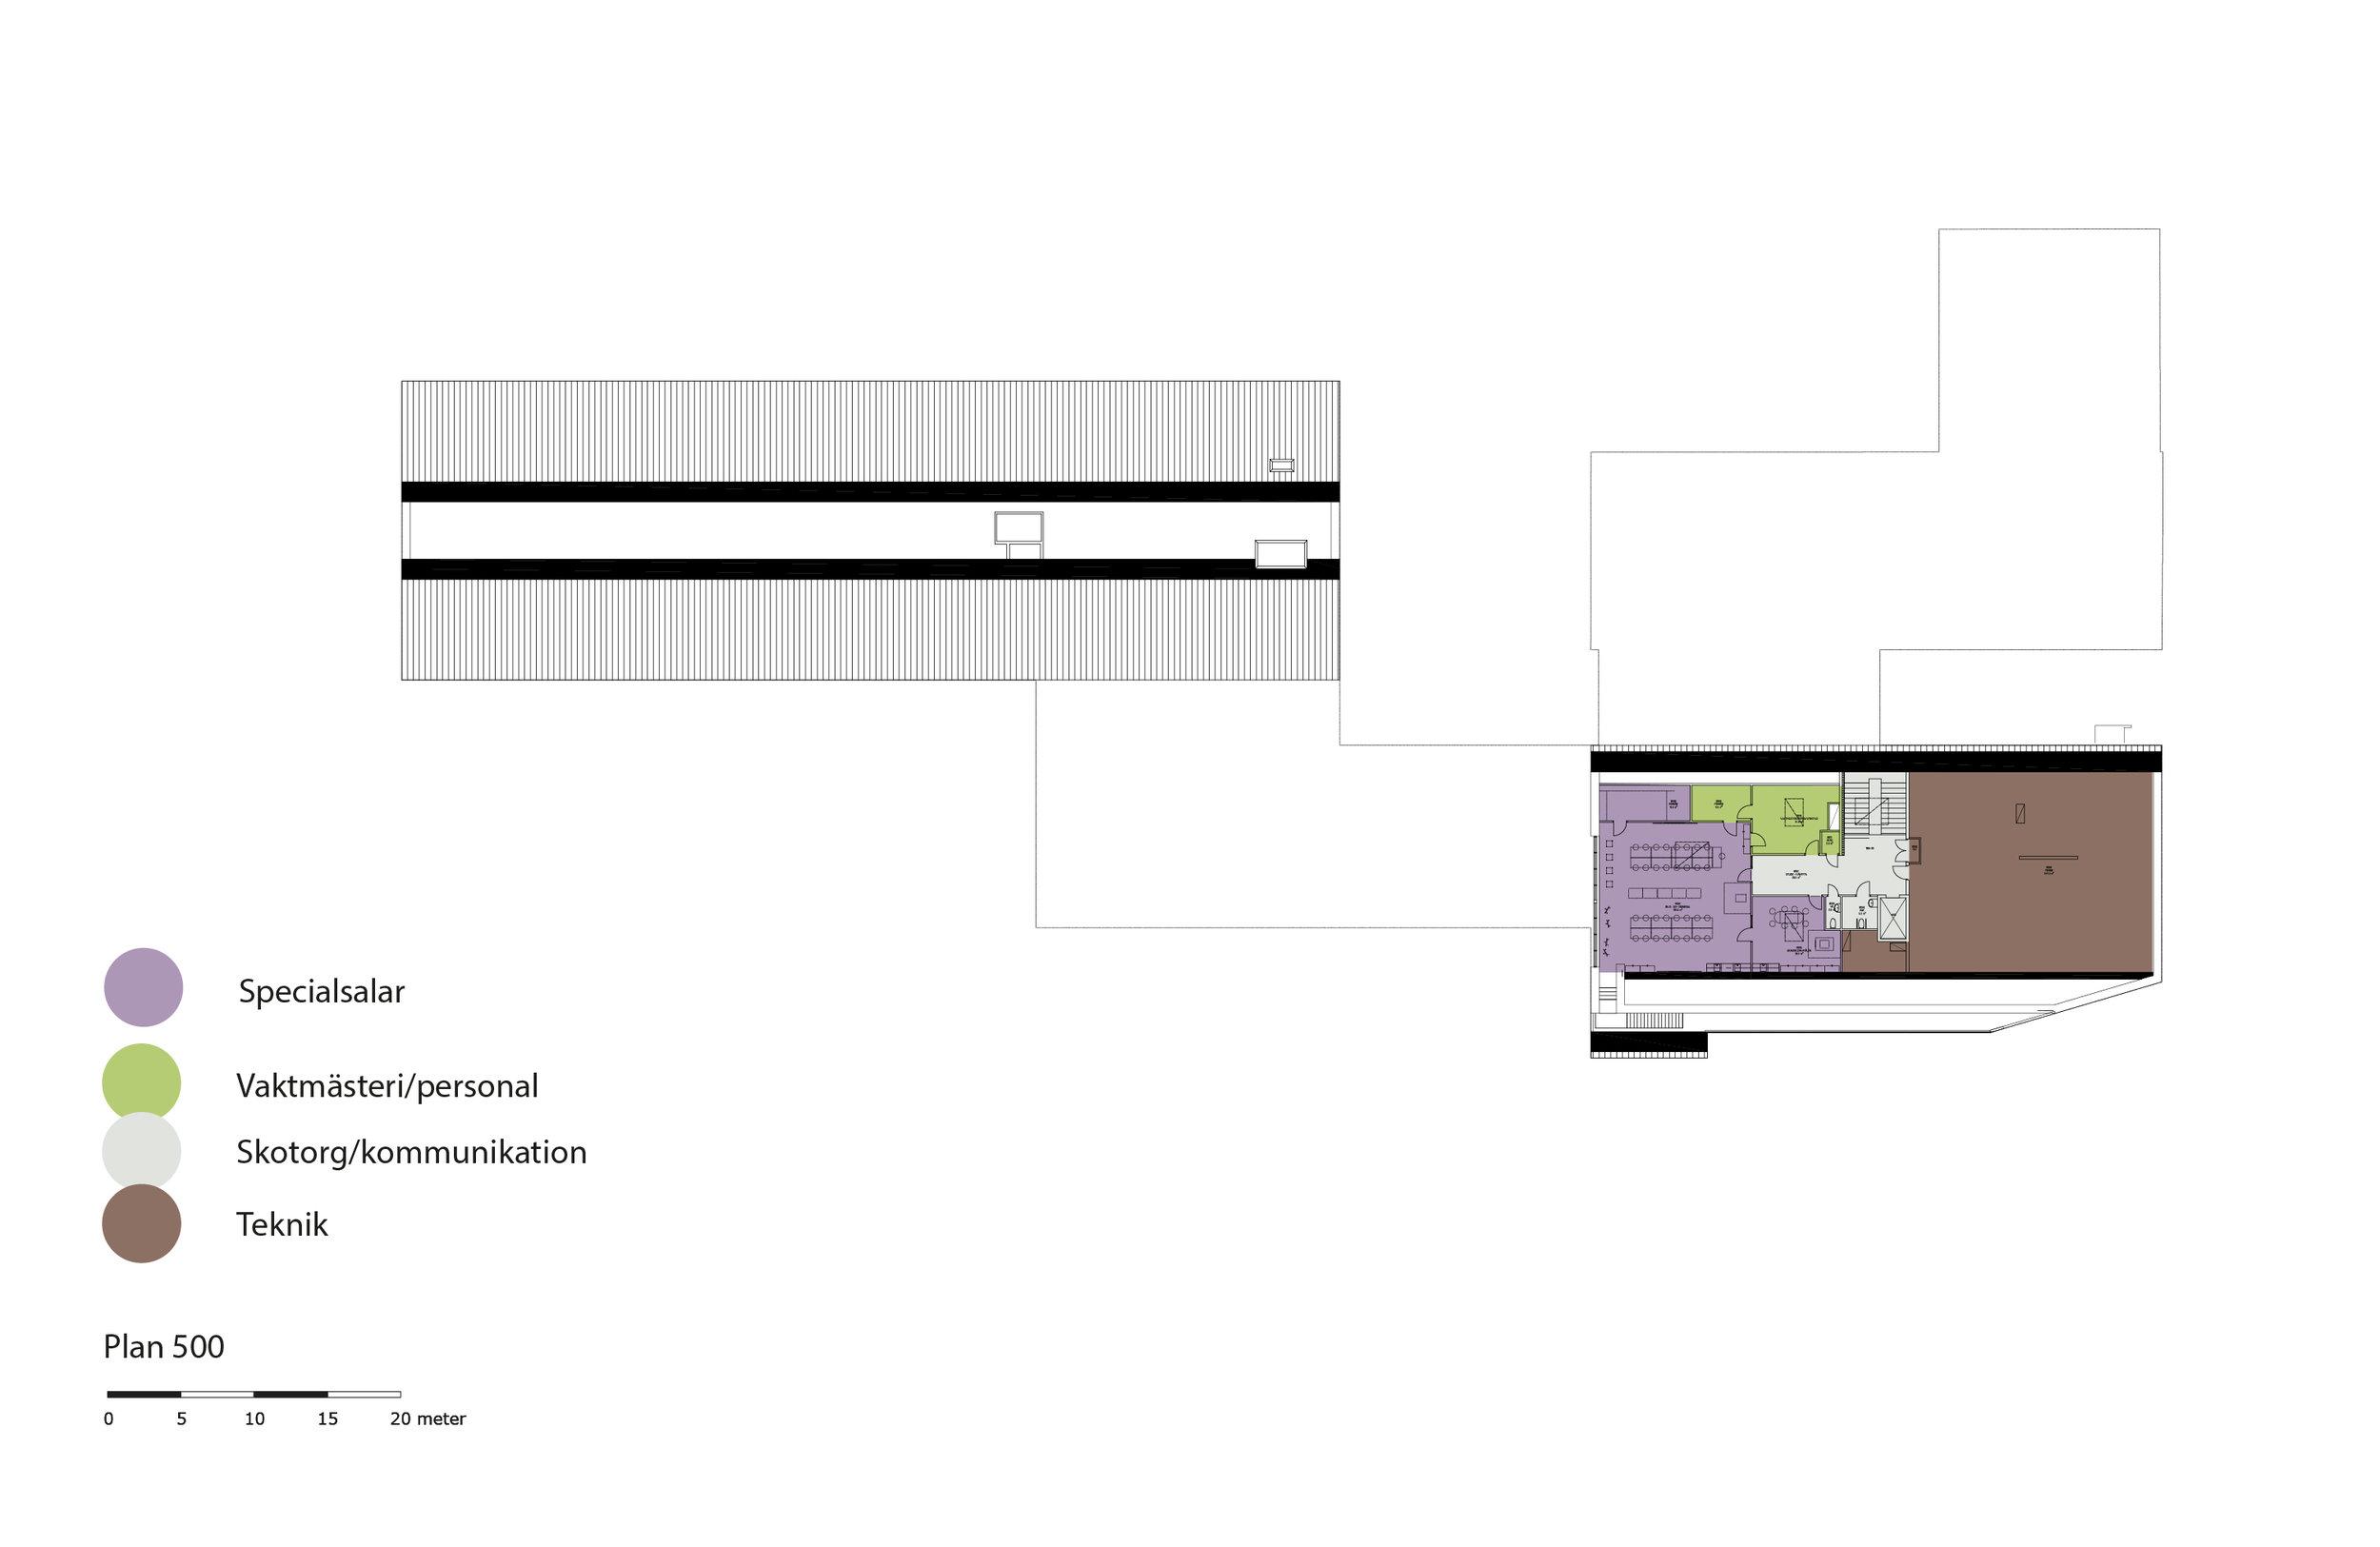 Plan500-01.jpg